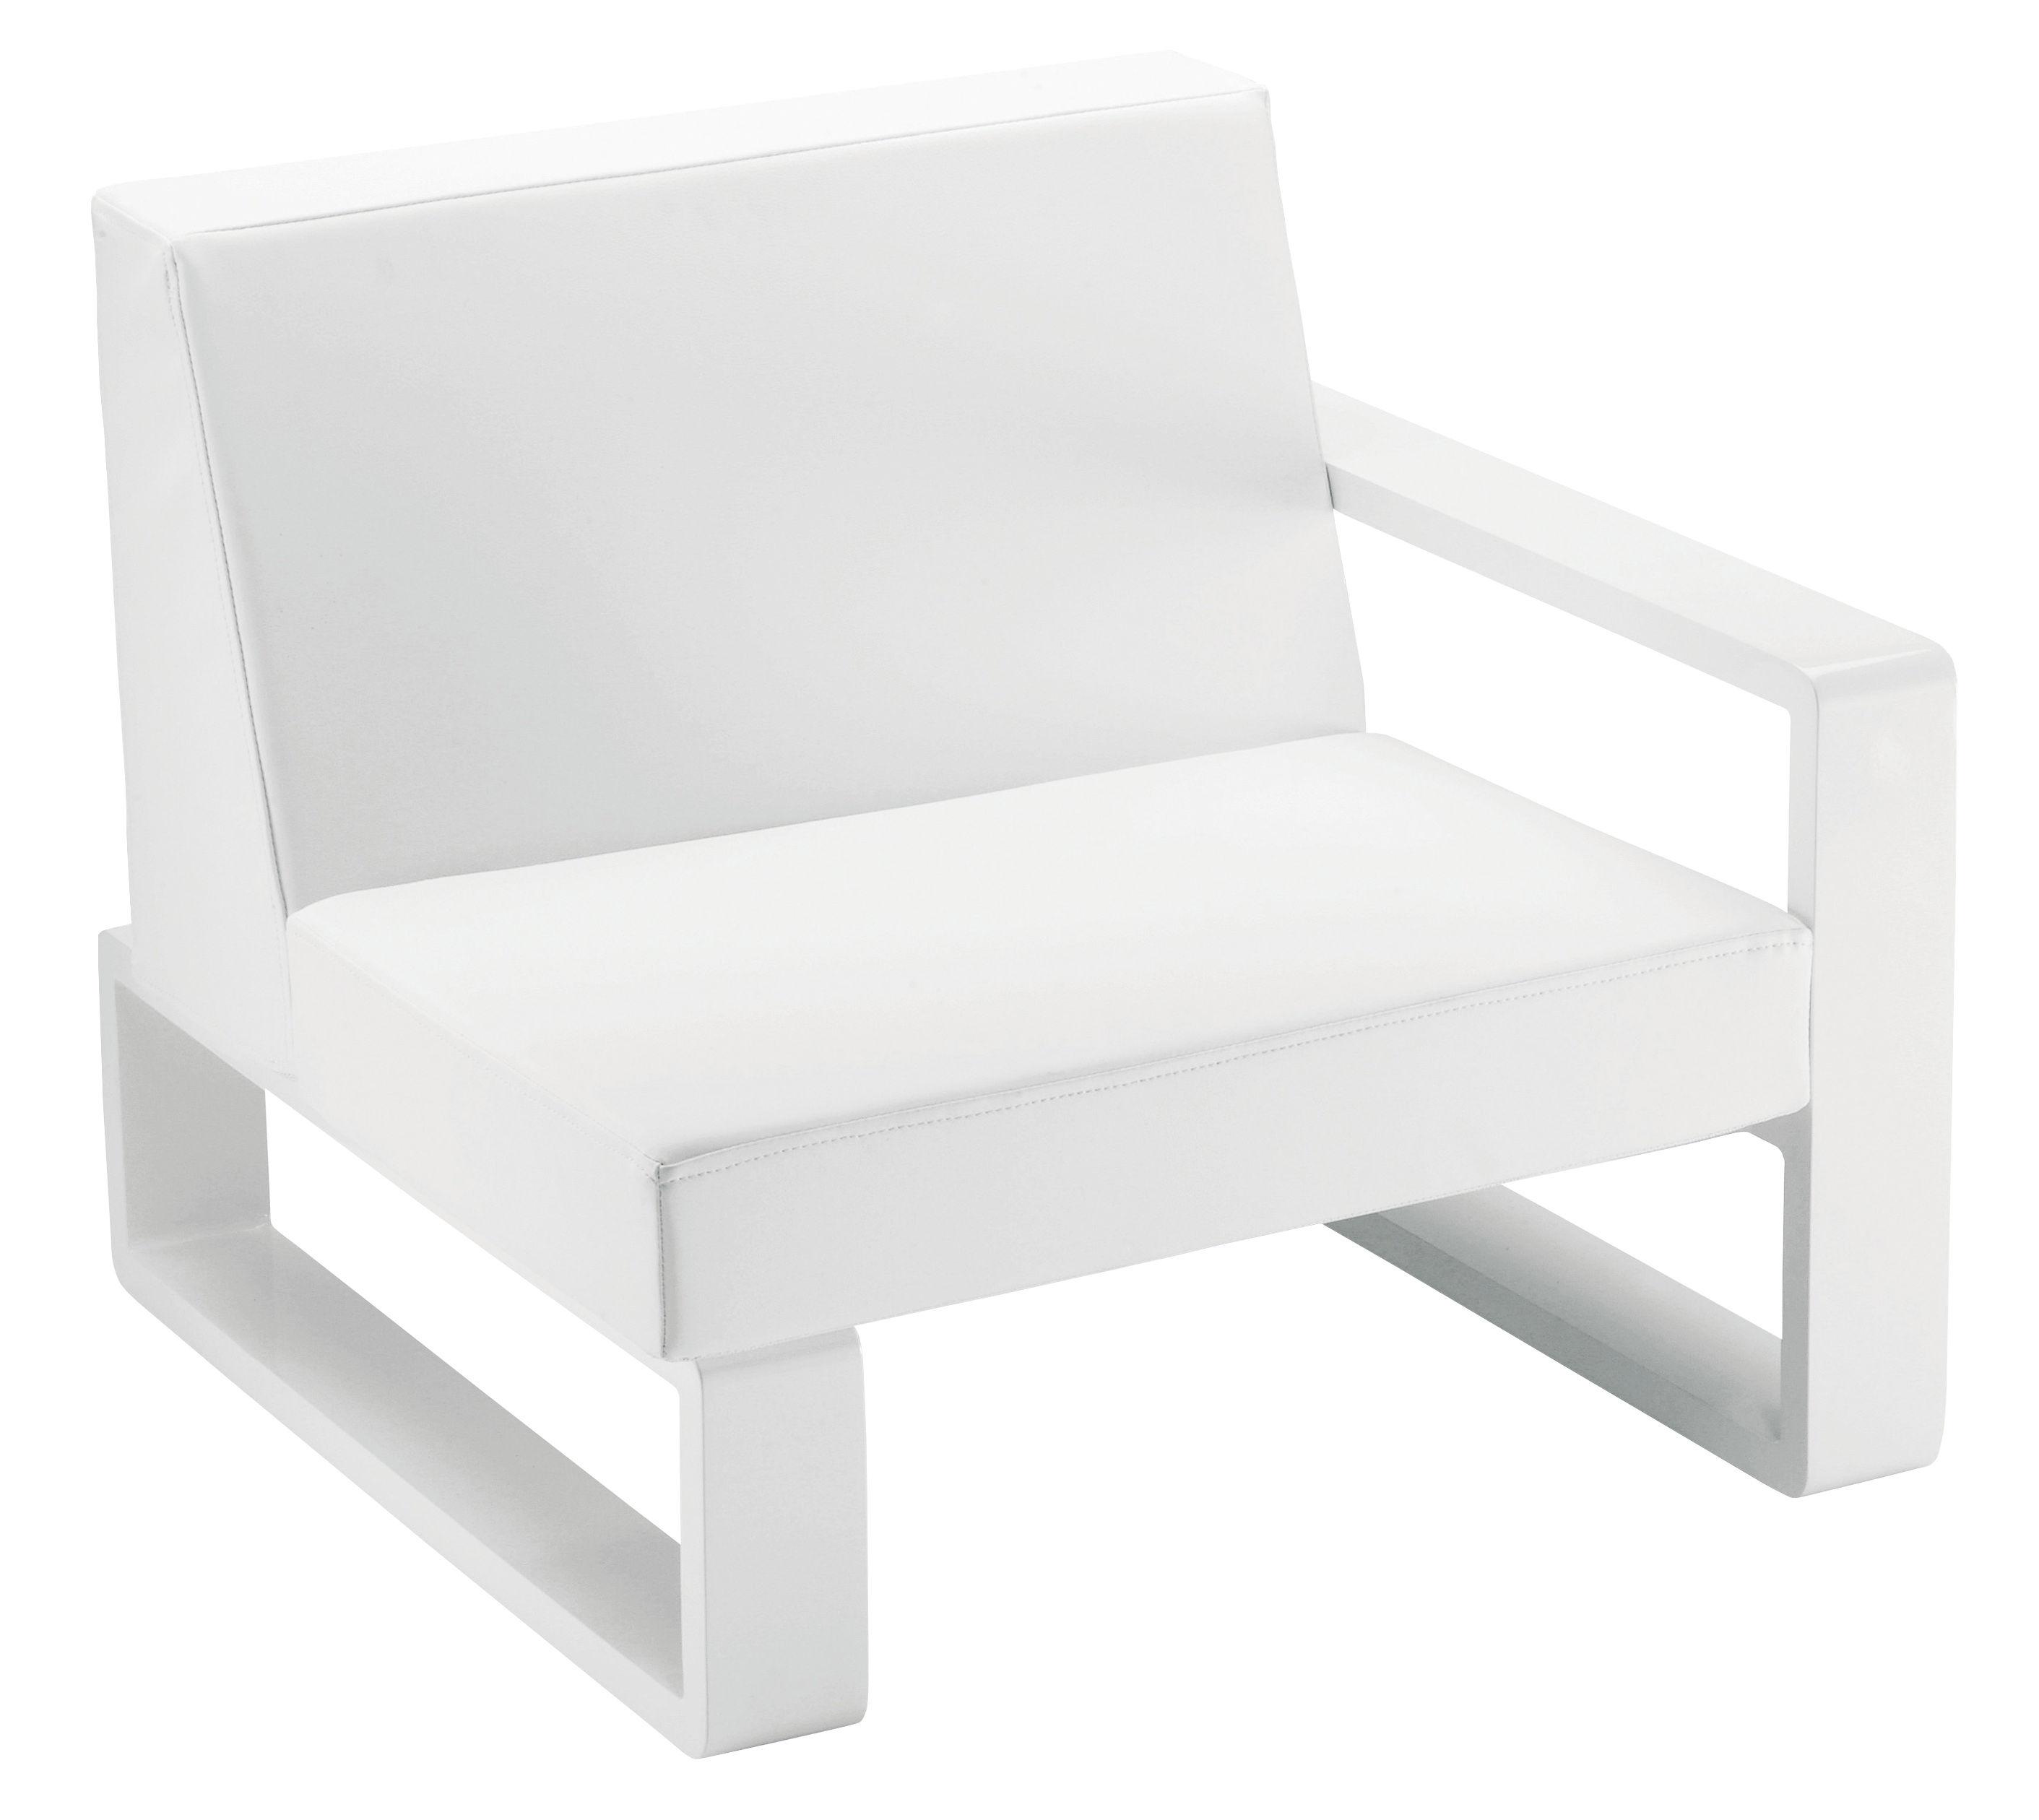 fauteuil rembourr kama vinyl blanc structure argent ego paris made in design. Black Bedroom Furniture Sets. Home Design Ideas